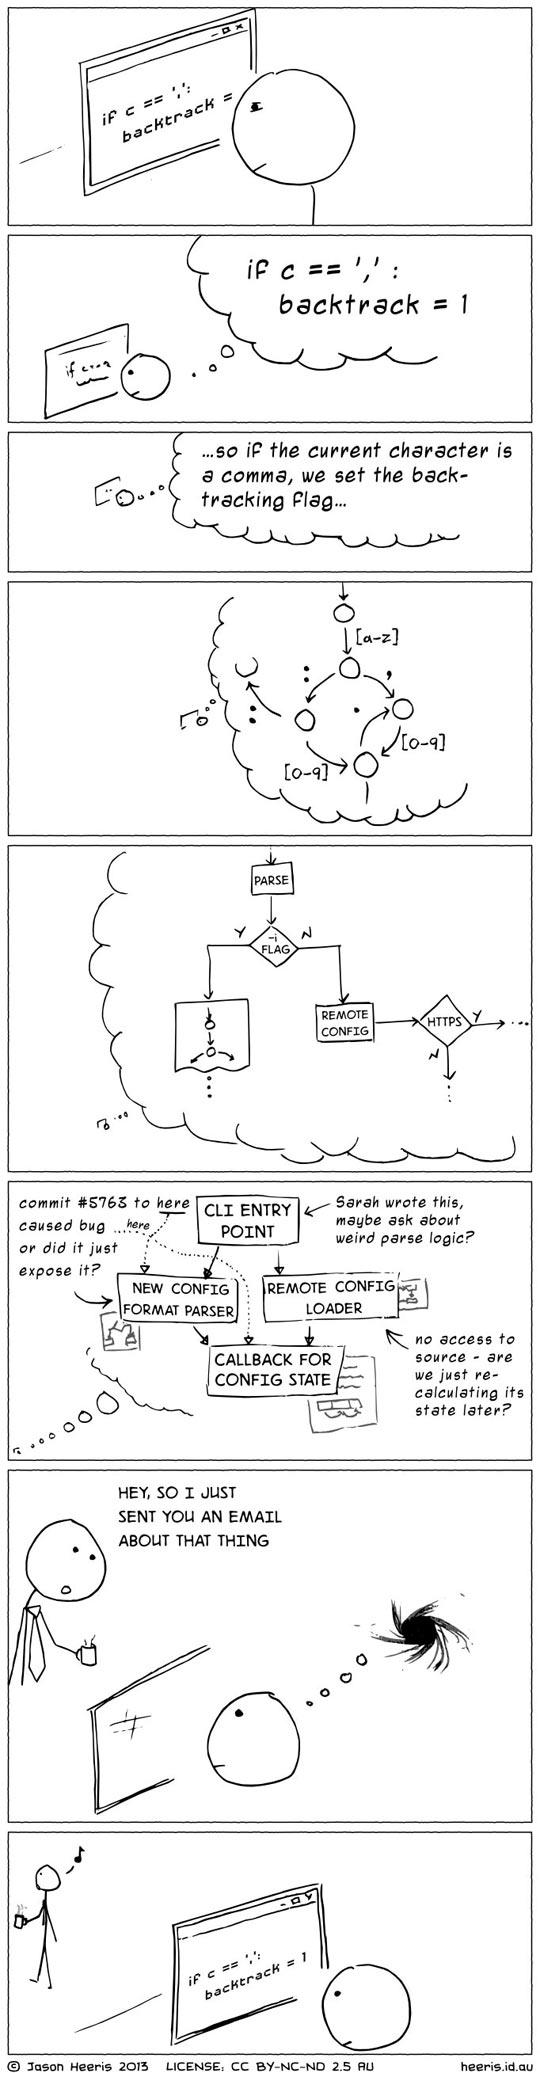 funny-programmer-comic-understand-message